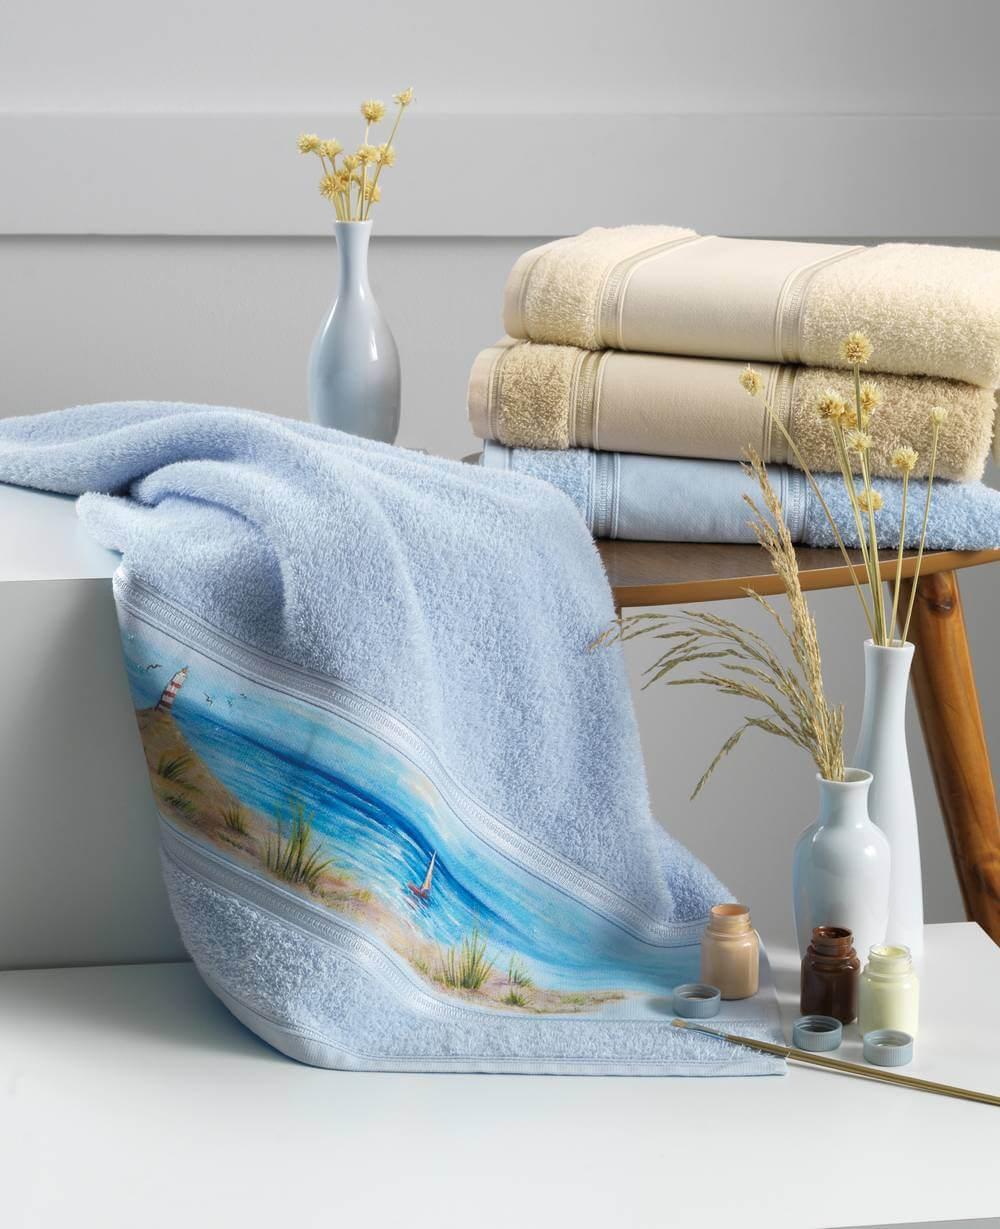 Toalha de Rosto para Pintar Karsten Bruna II - Gramatura: 370g/m²